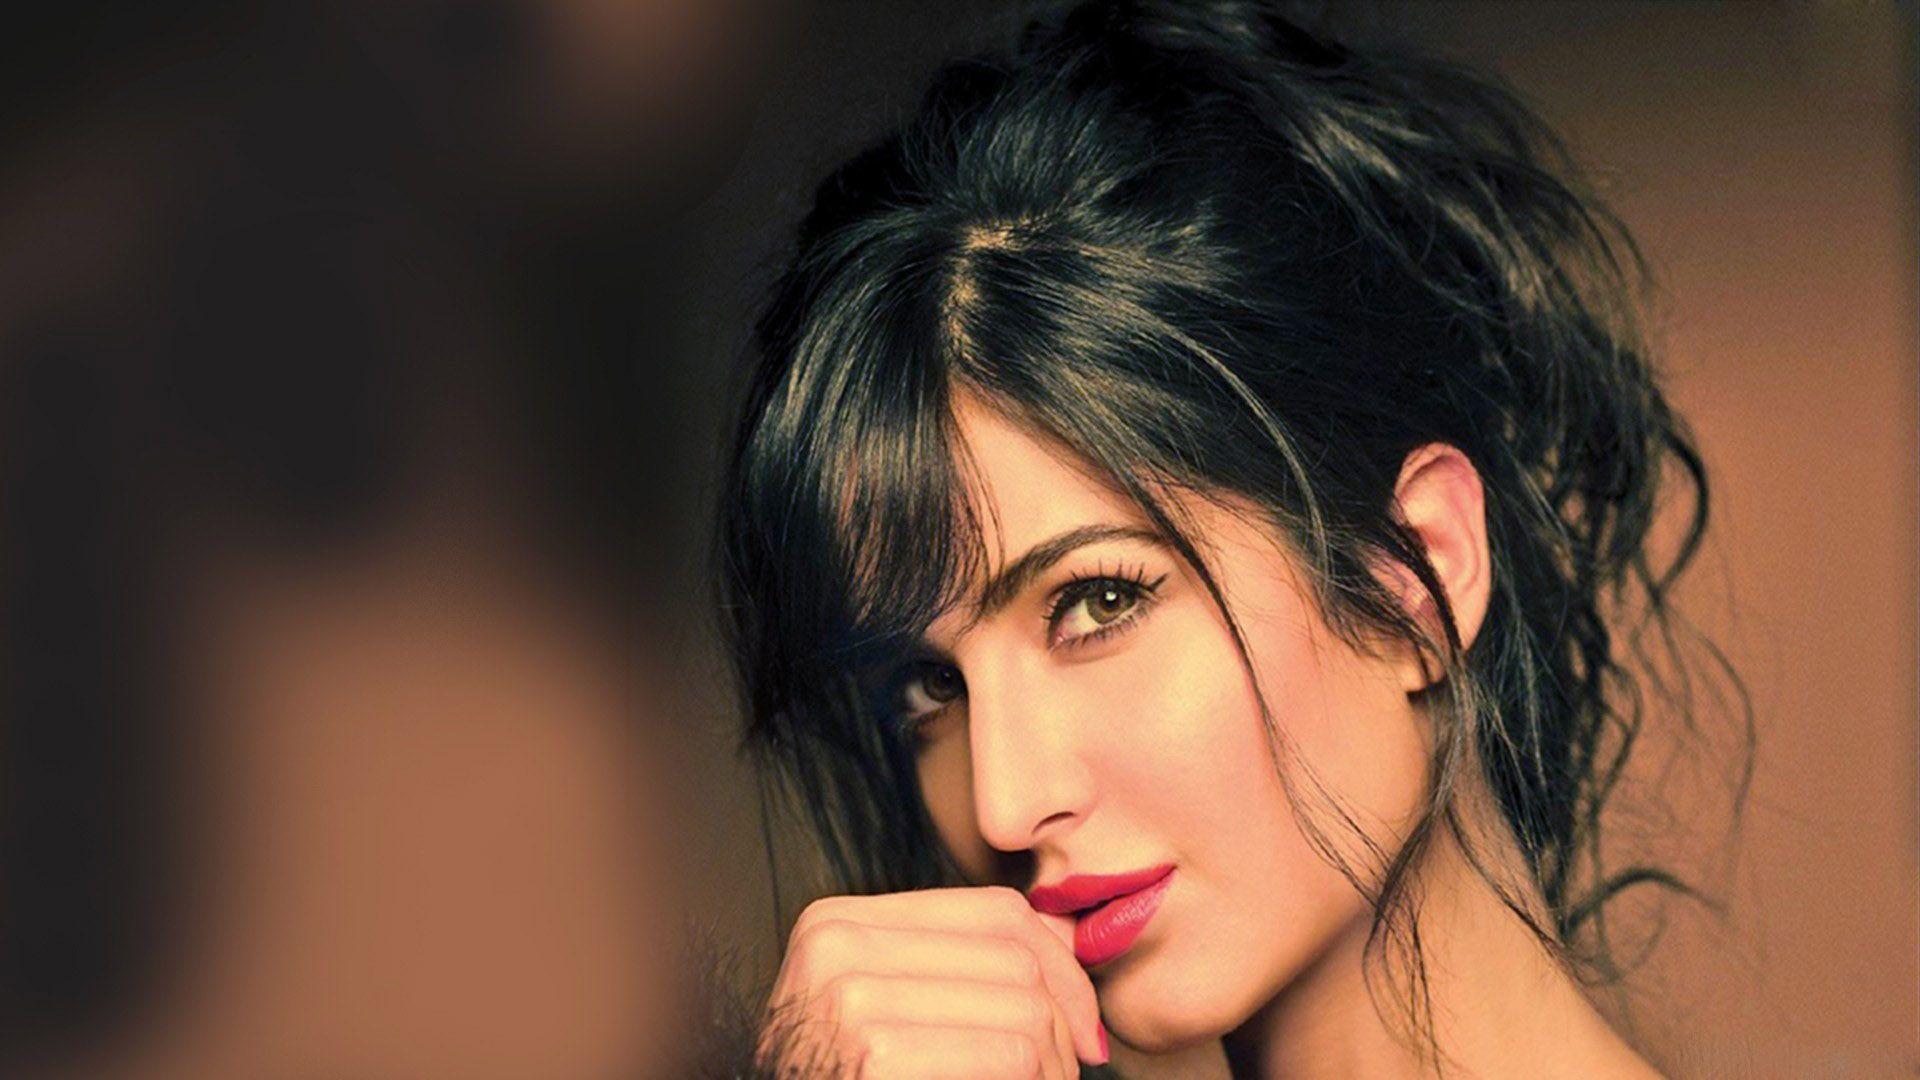 katrina kaif bollywood actress 4k wallpaper 2533